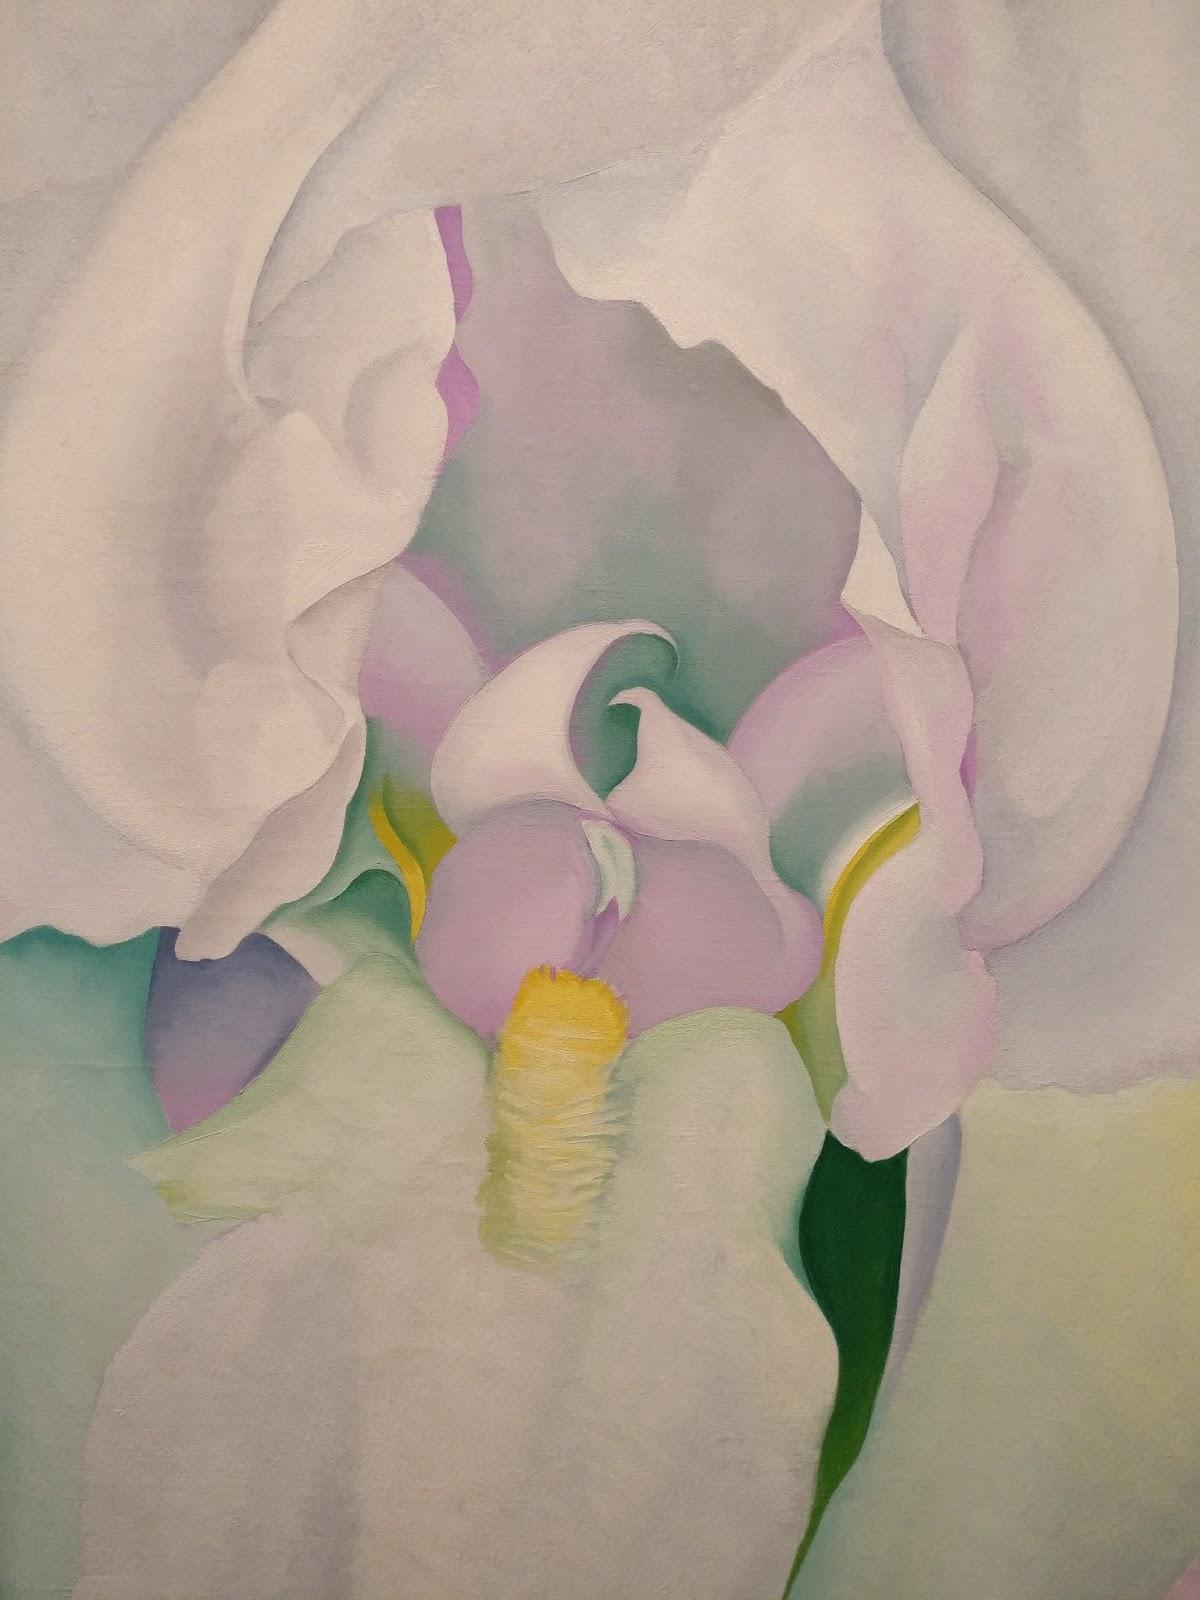 White Iris Painting By Georgia O Keeffe At Virginia Museum Of Fine Arts Richmond Va